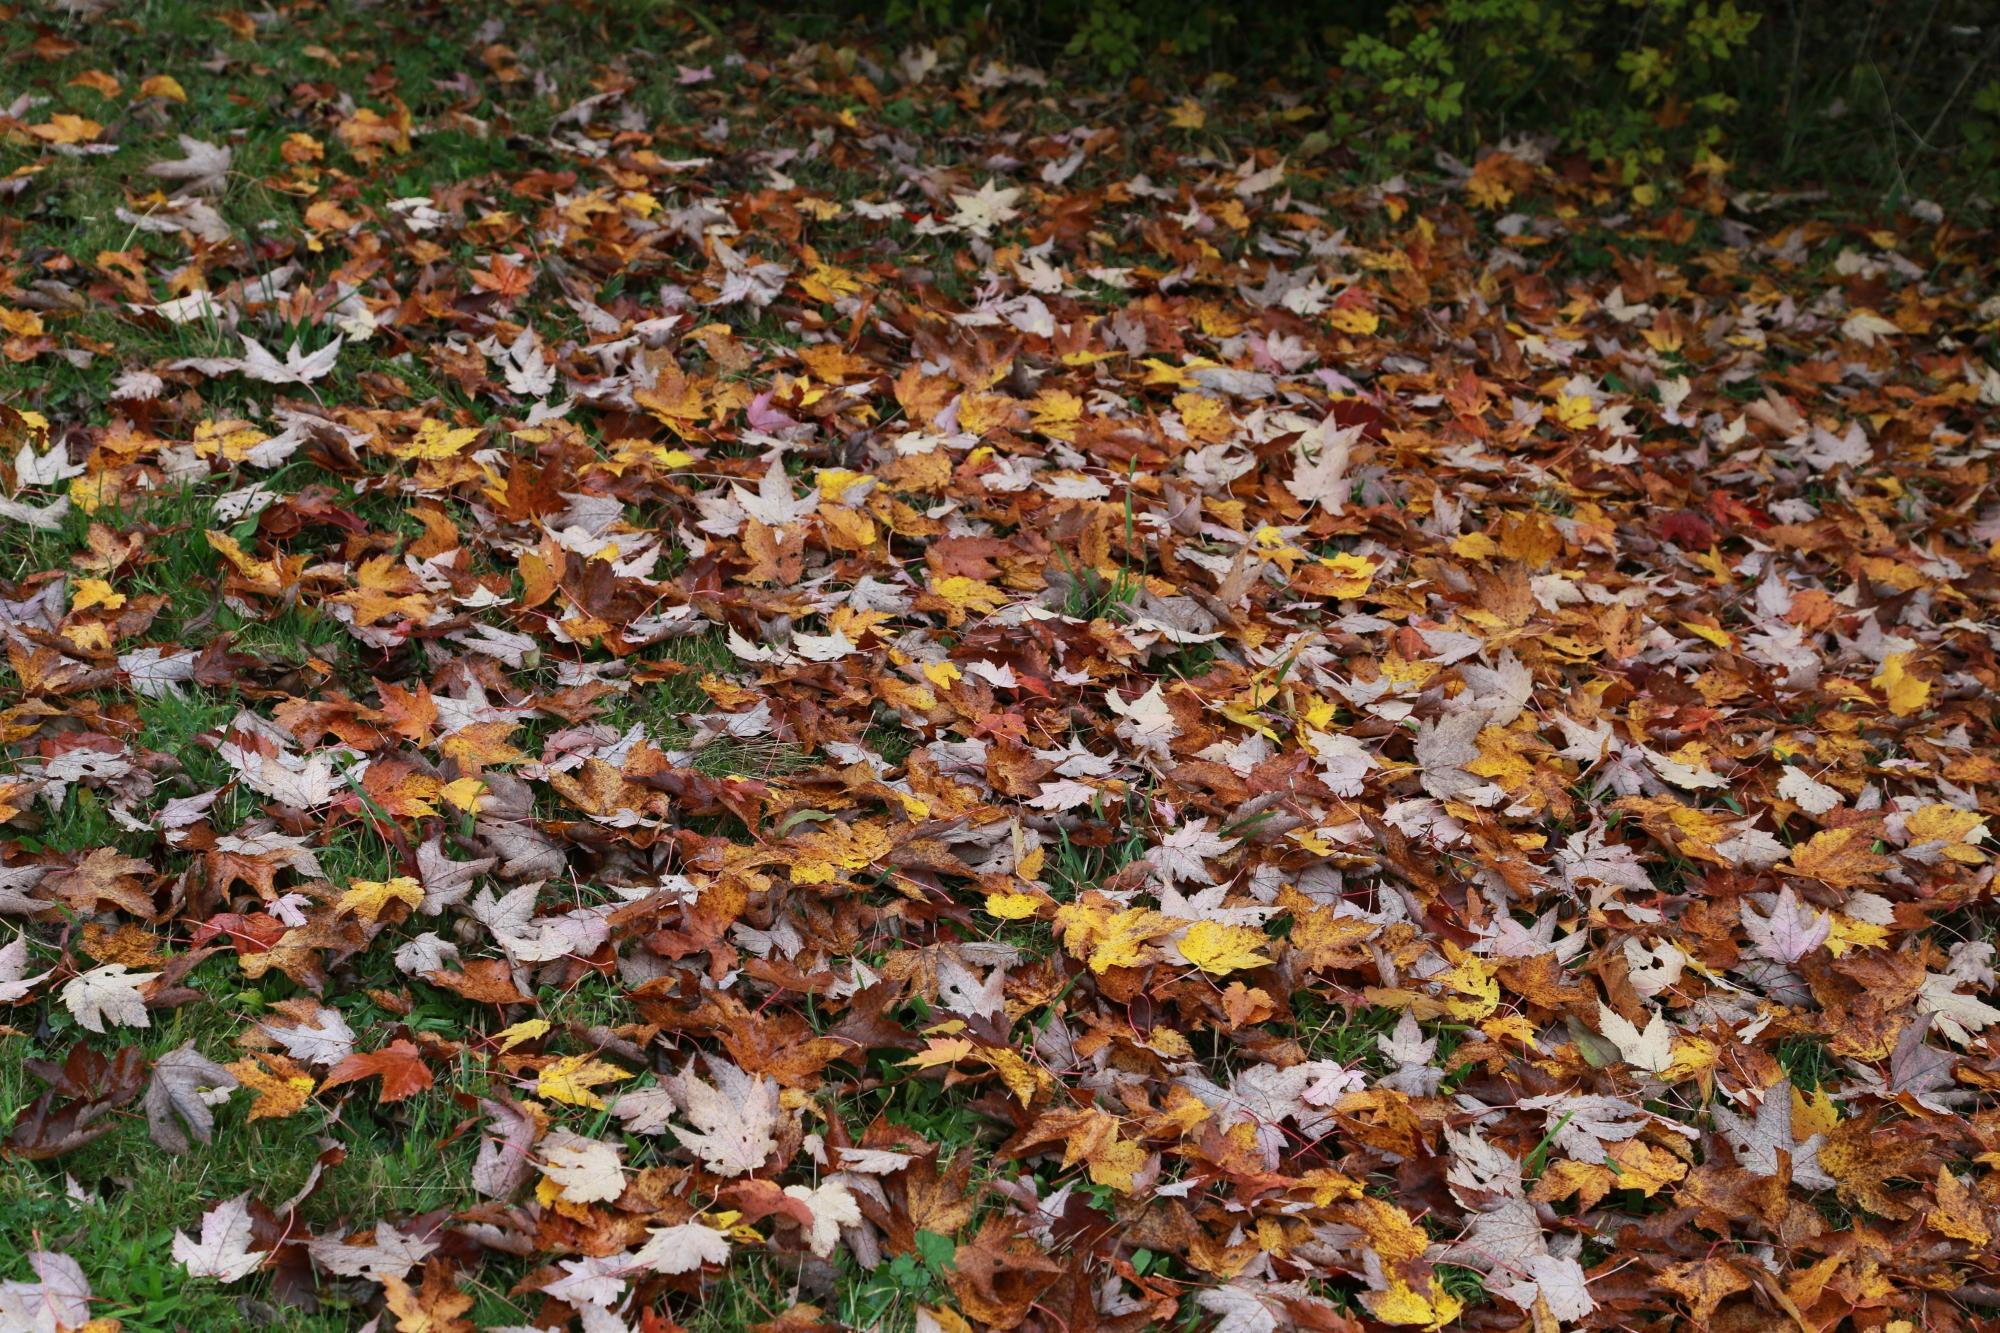 Garden World   How to Compost Fallen Leaves   Garden World